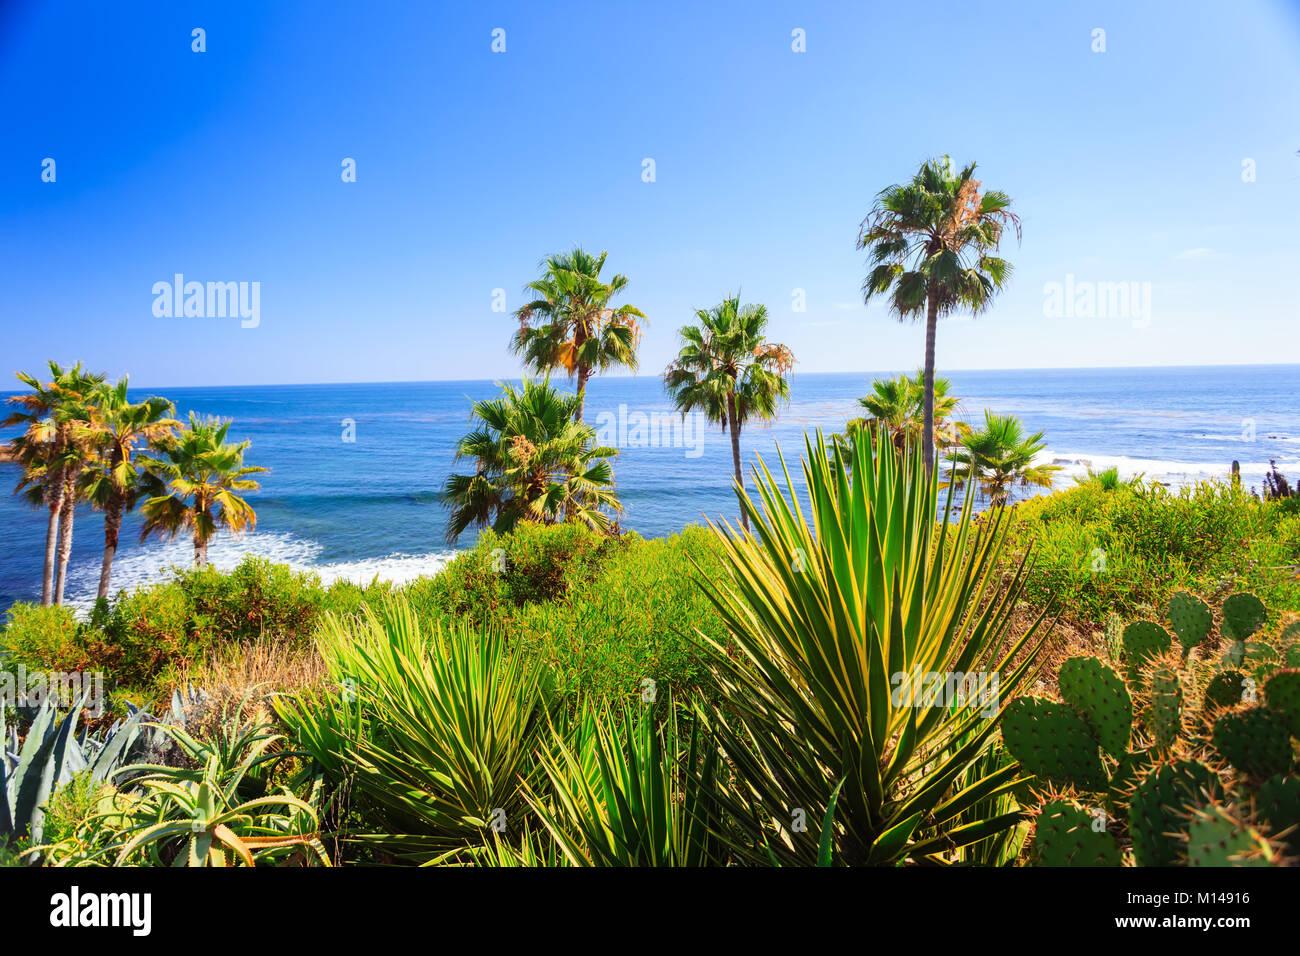 Heisler Park Laguna Beach Stock Photos & Heisler Park ...  Heisler Park La...